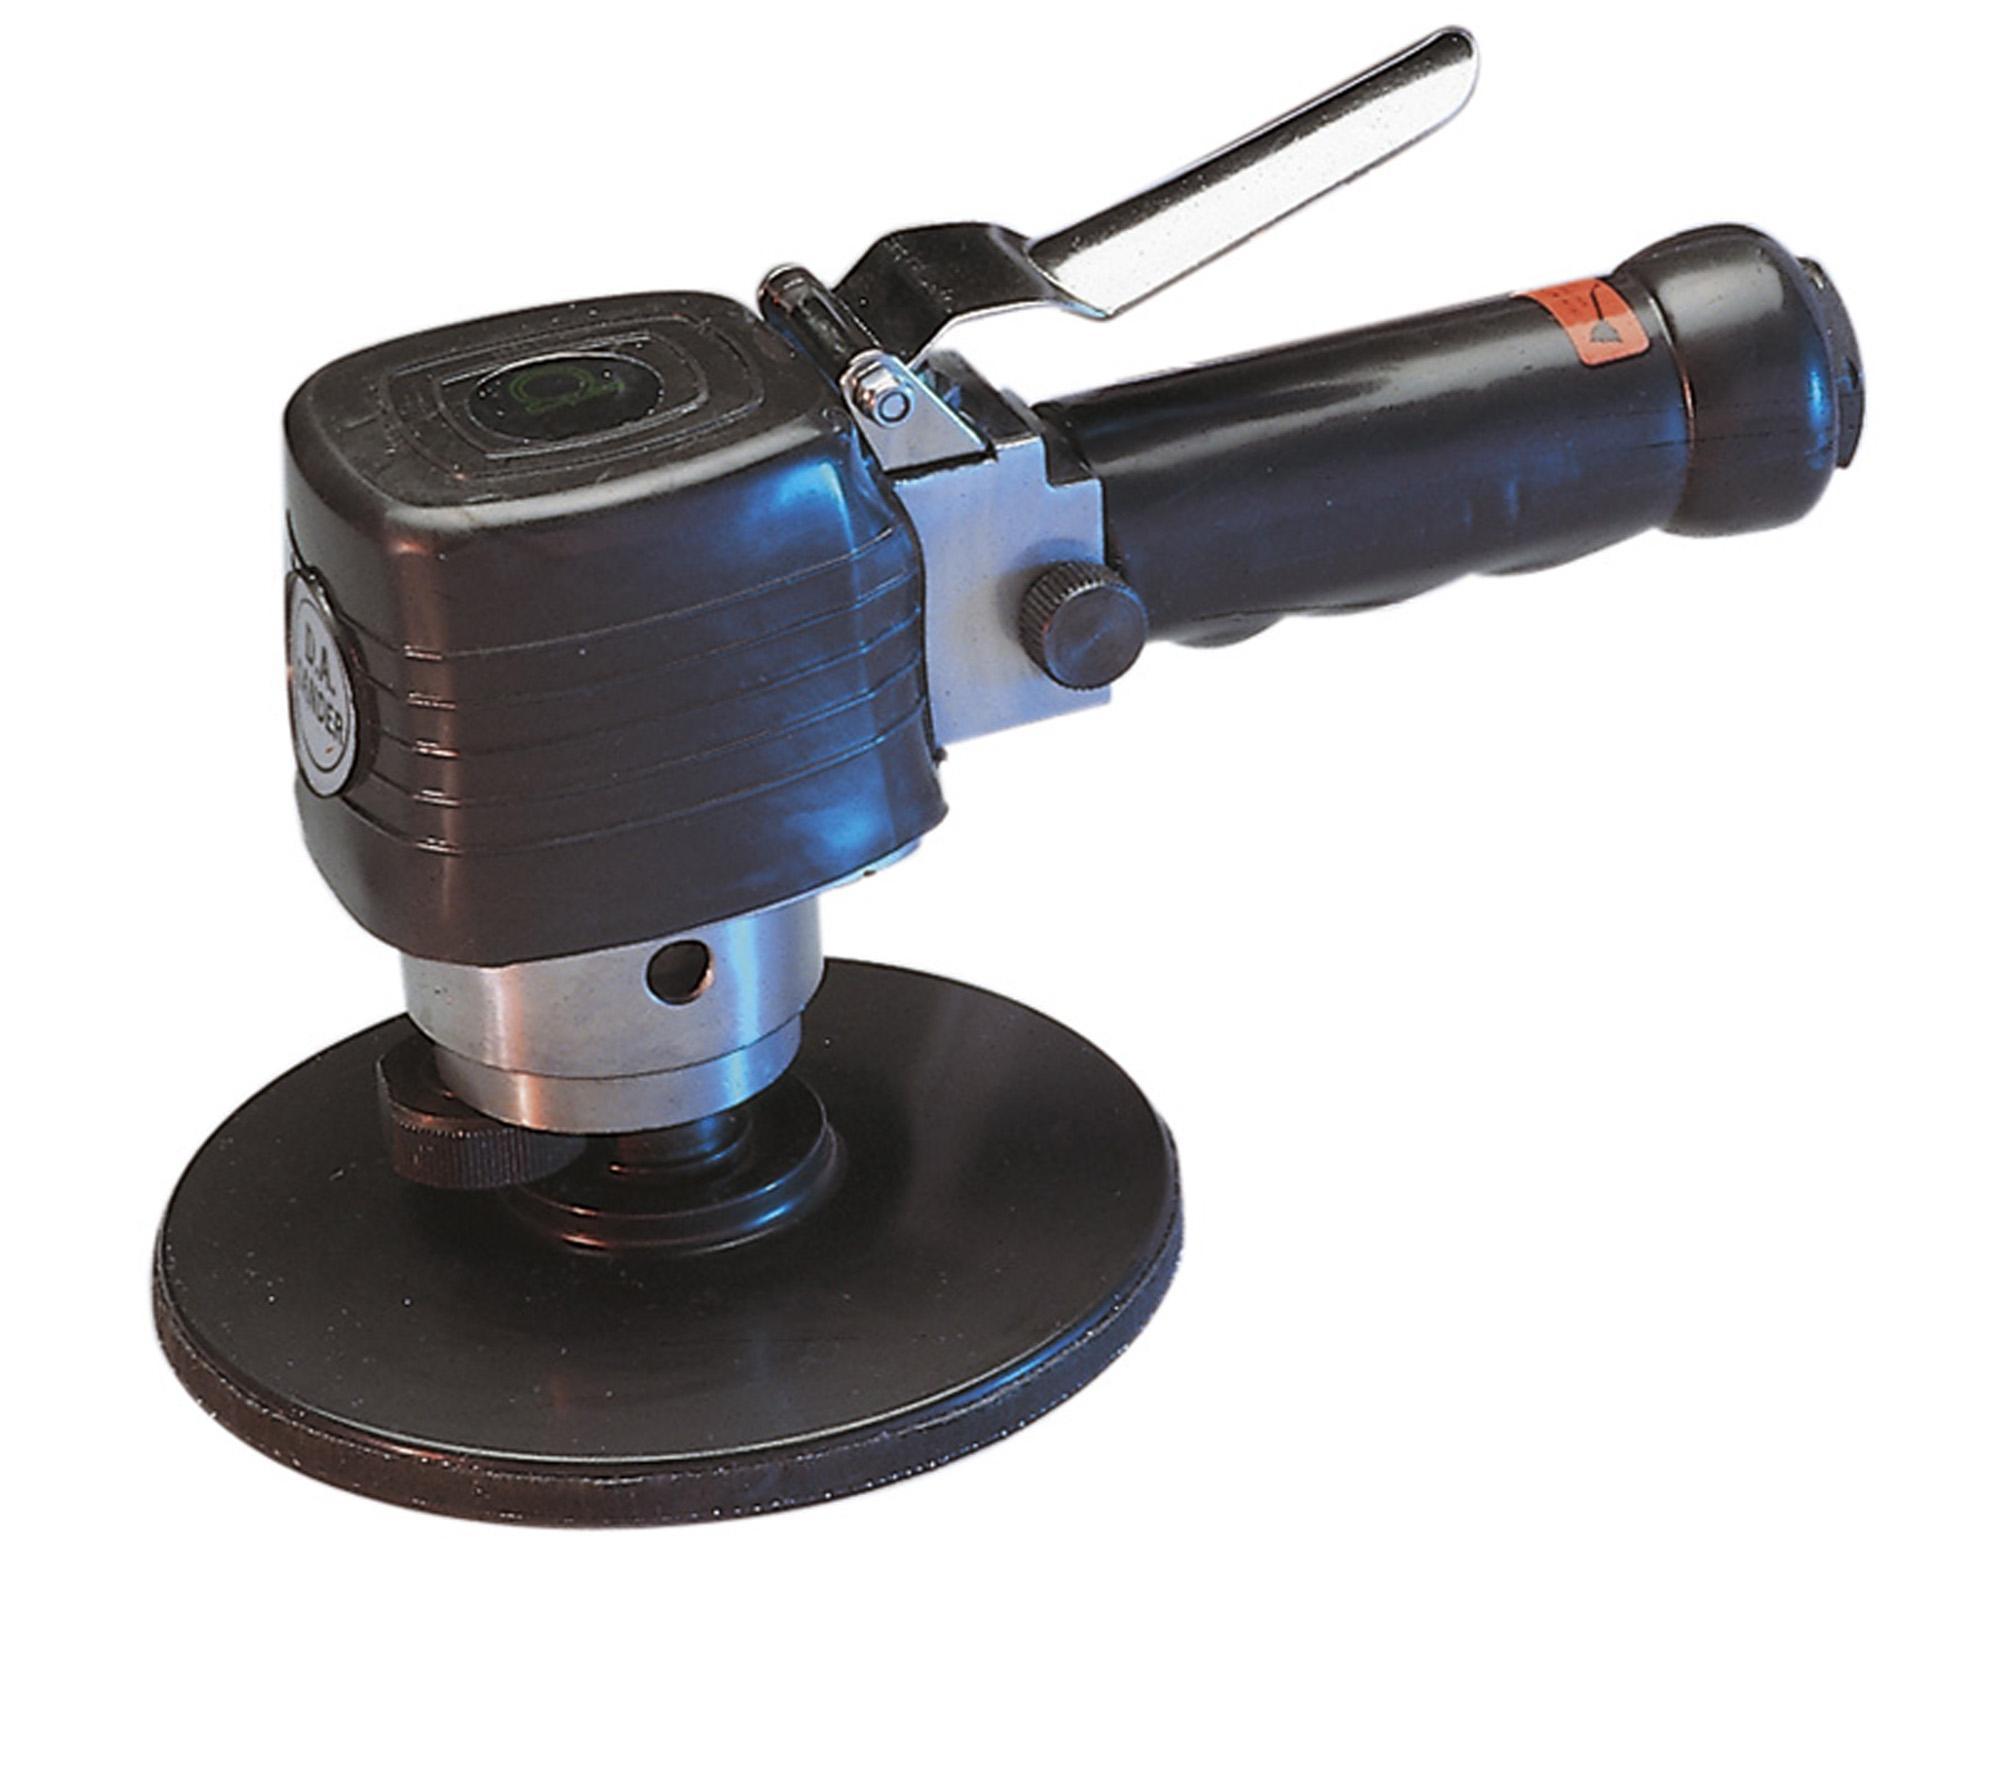 Sip air sander quot pad dual action speed regulator psi